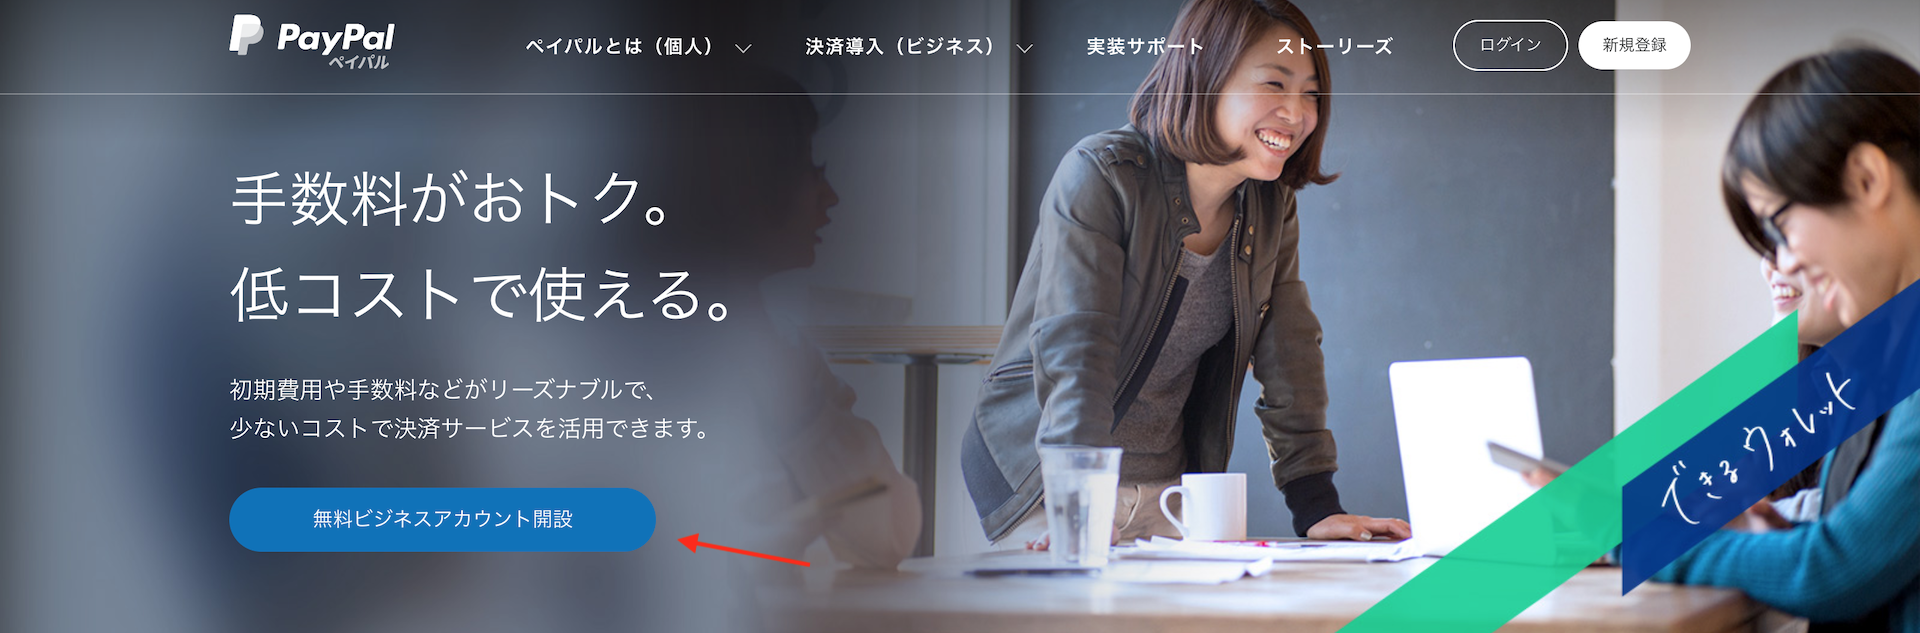 PayPal 公式サイト